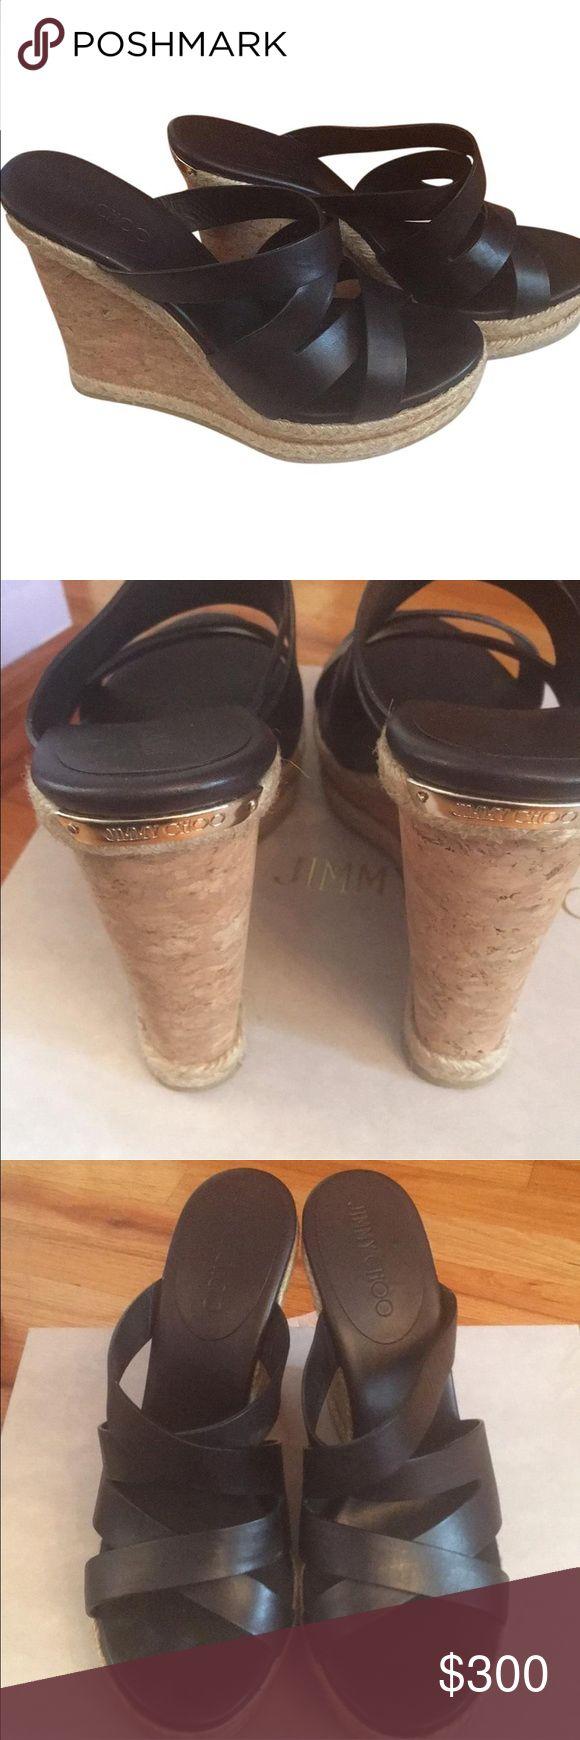 Jimmy Choo Wedges Brand new leather wedges Jimmy Choo Shoes Wedges